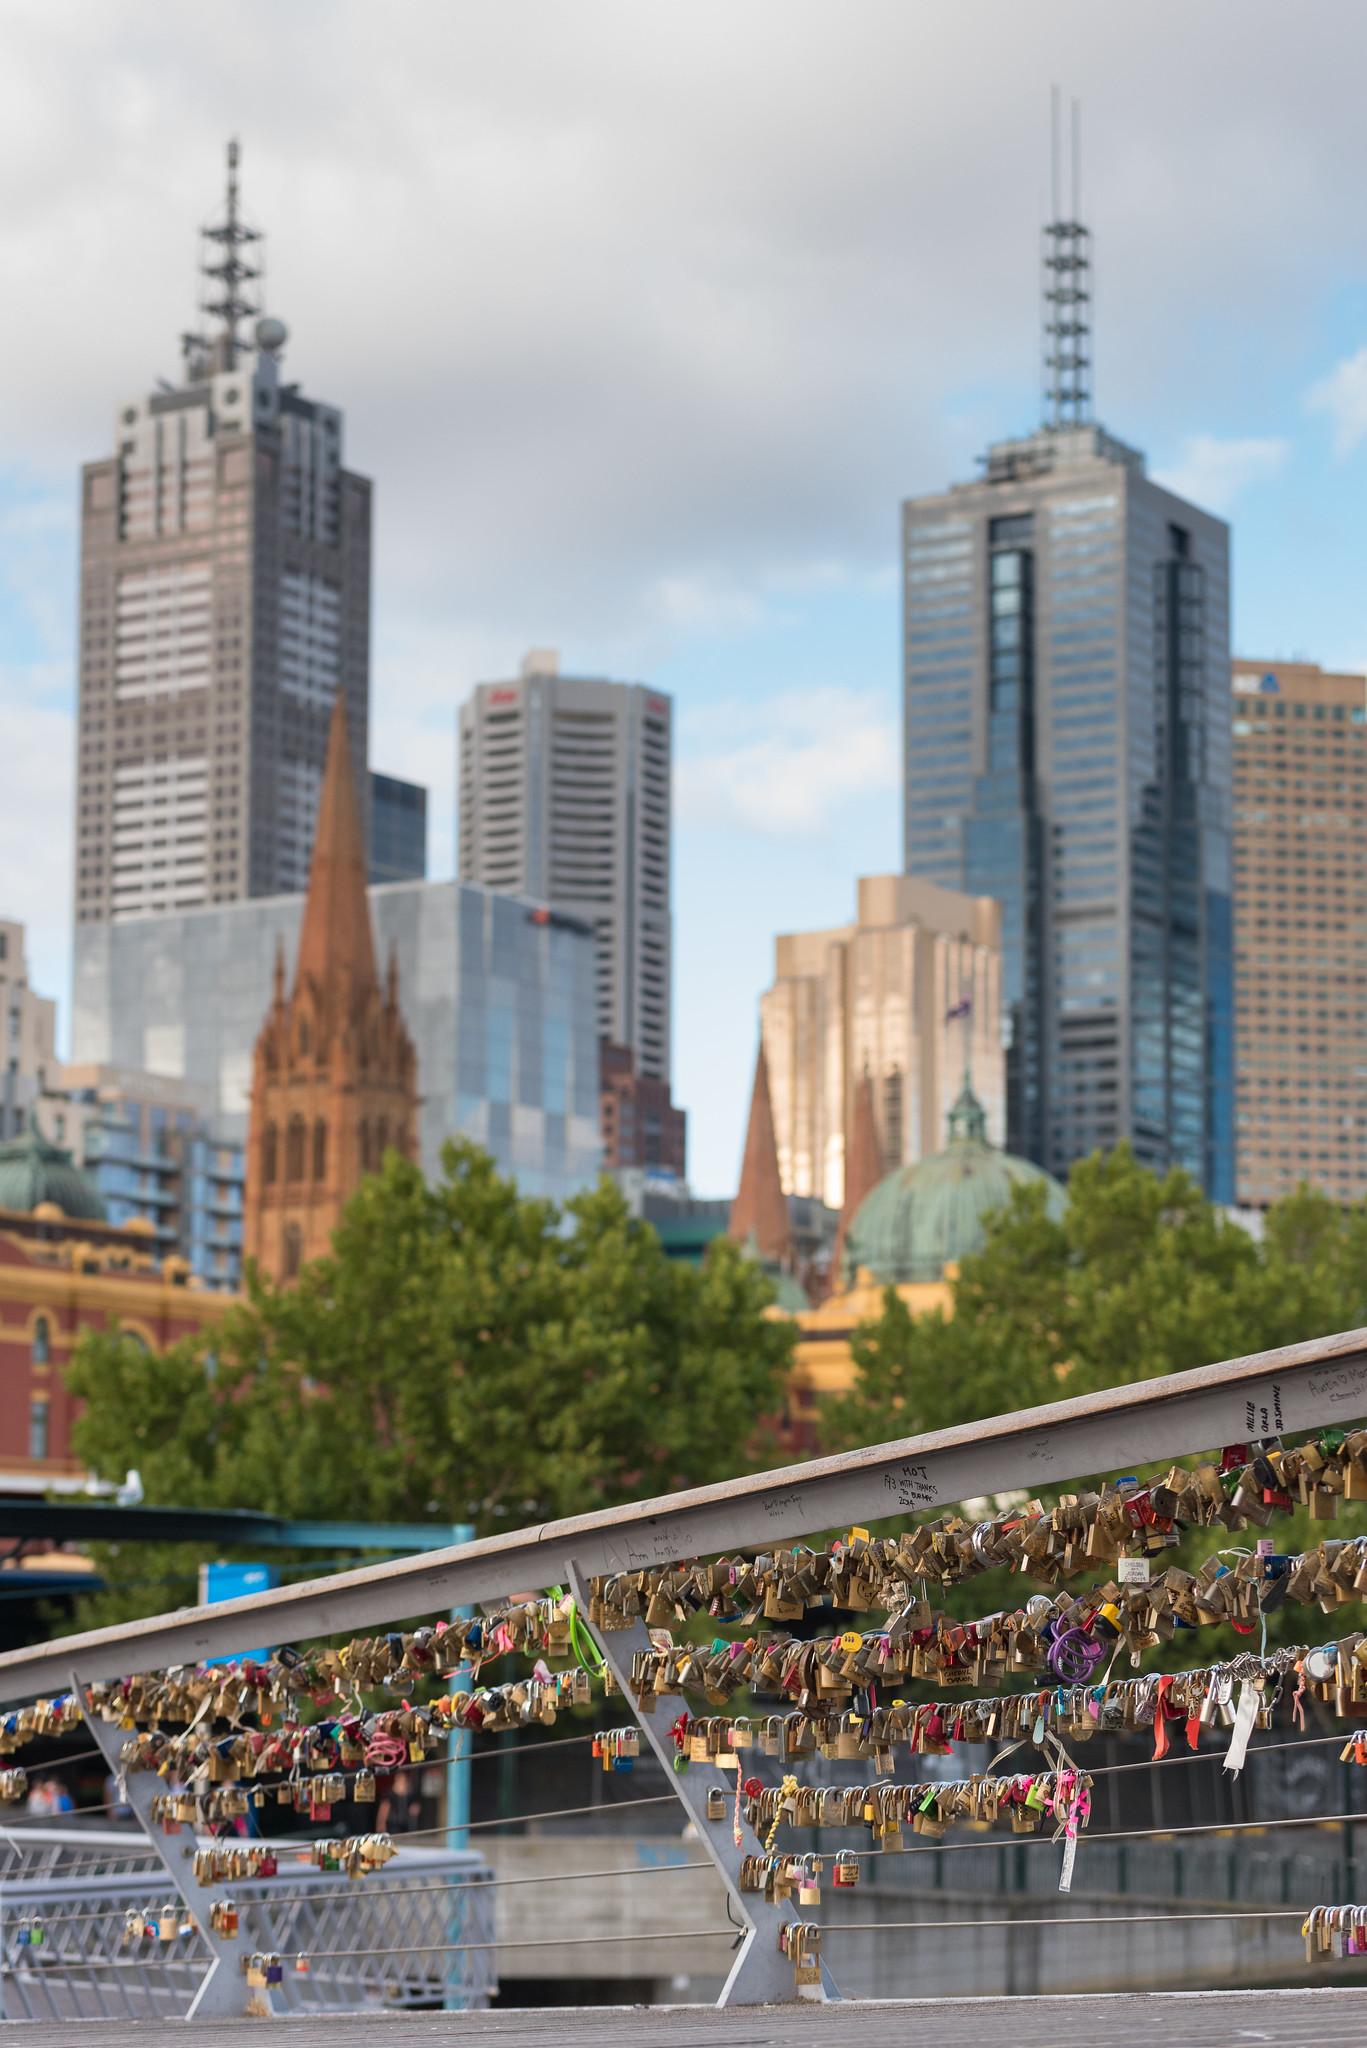 Melbourne Love Bridge